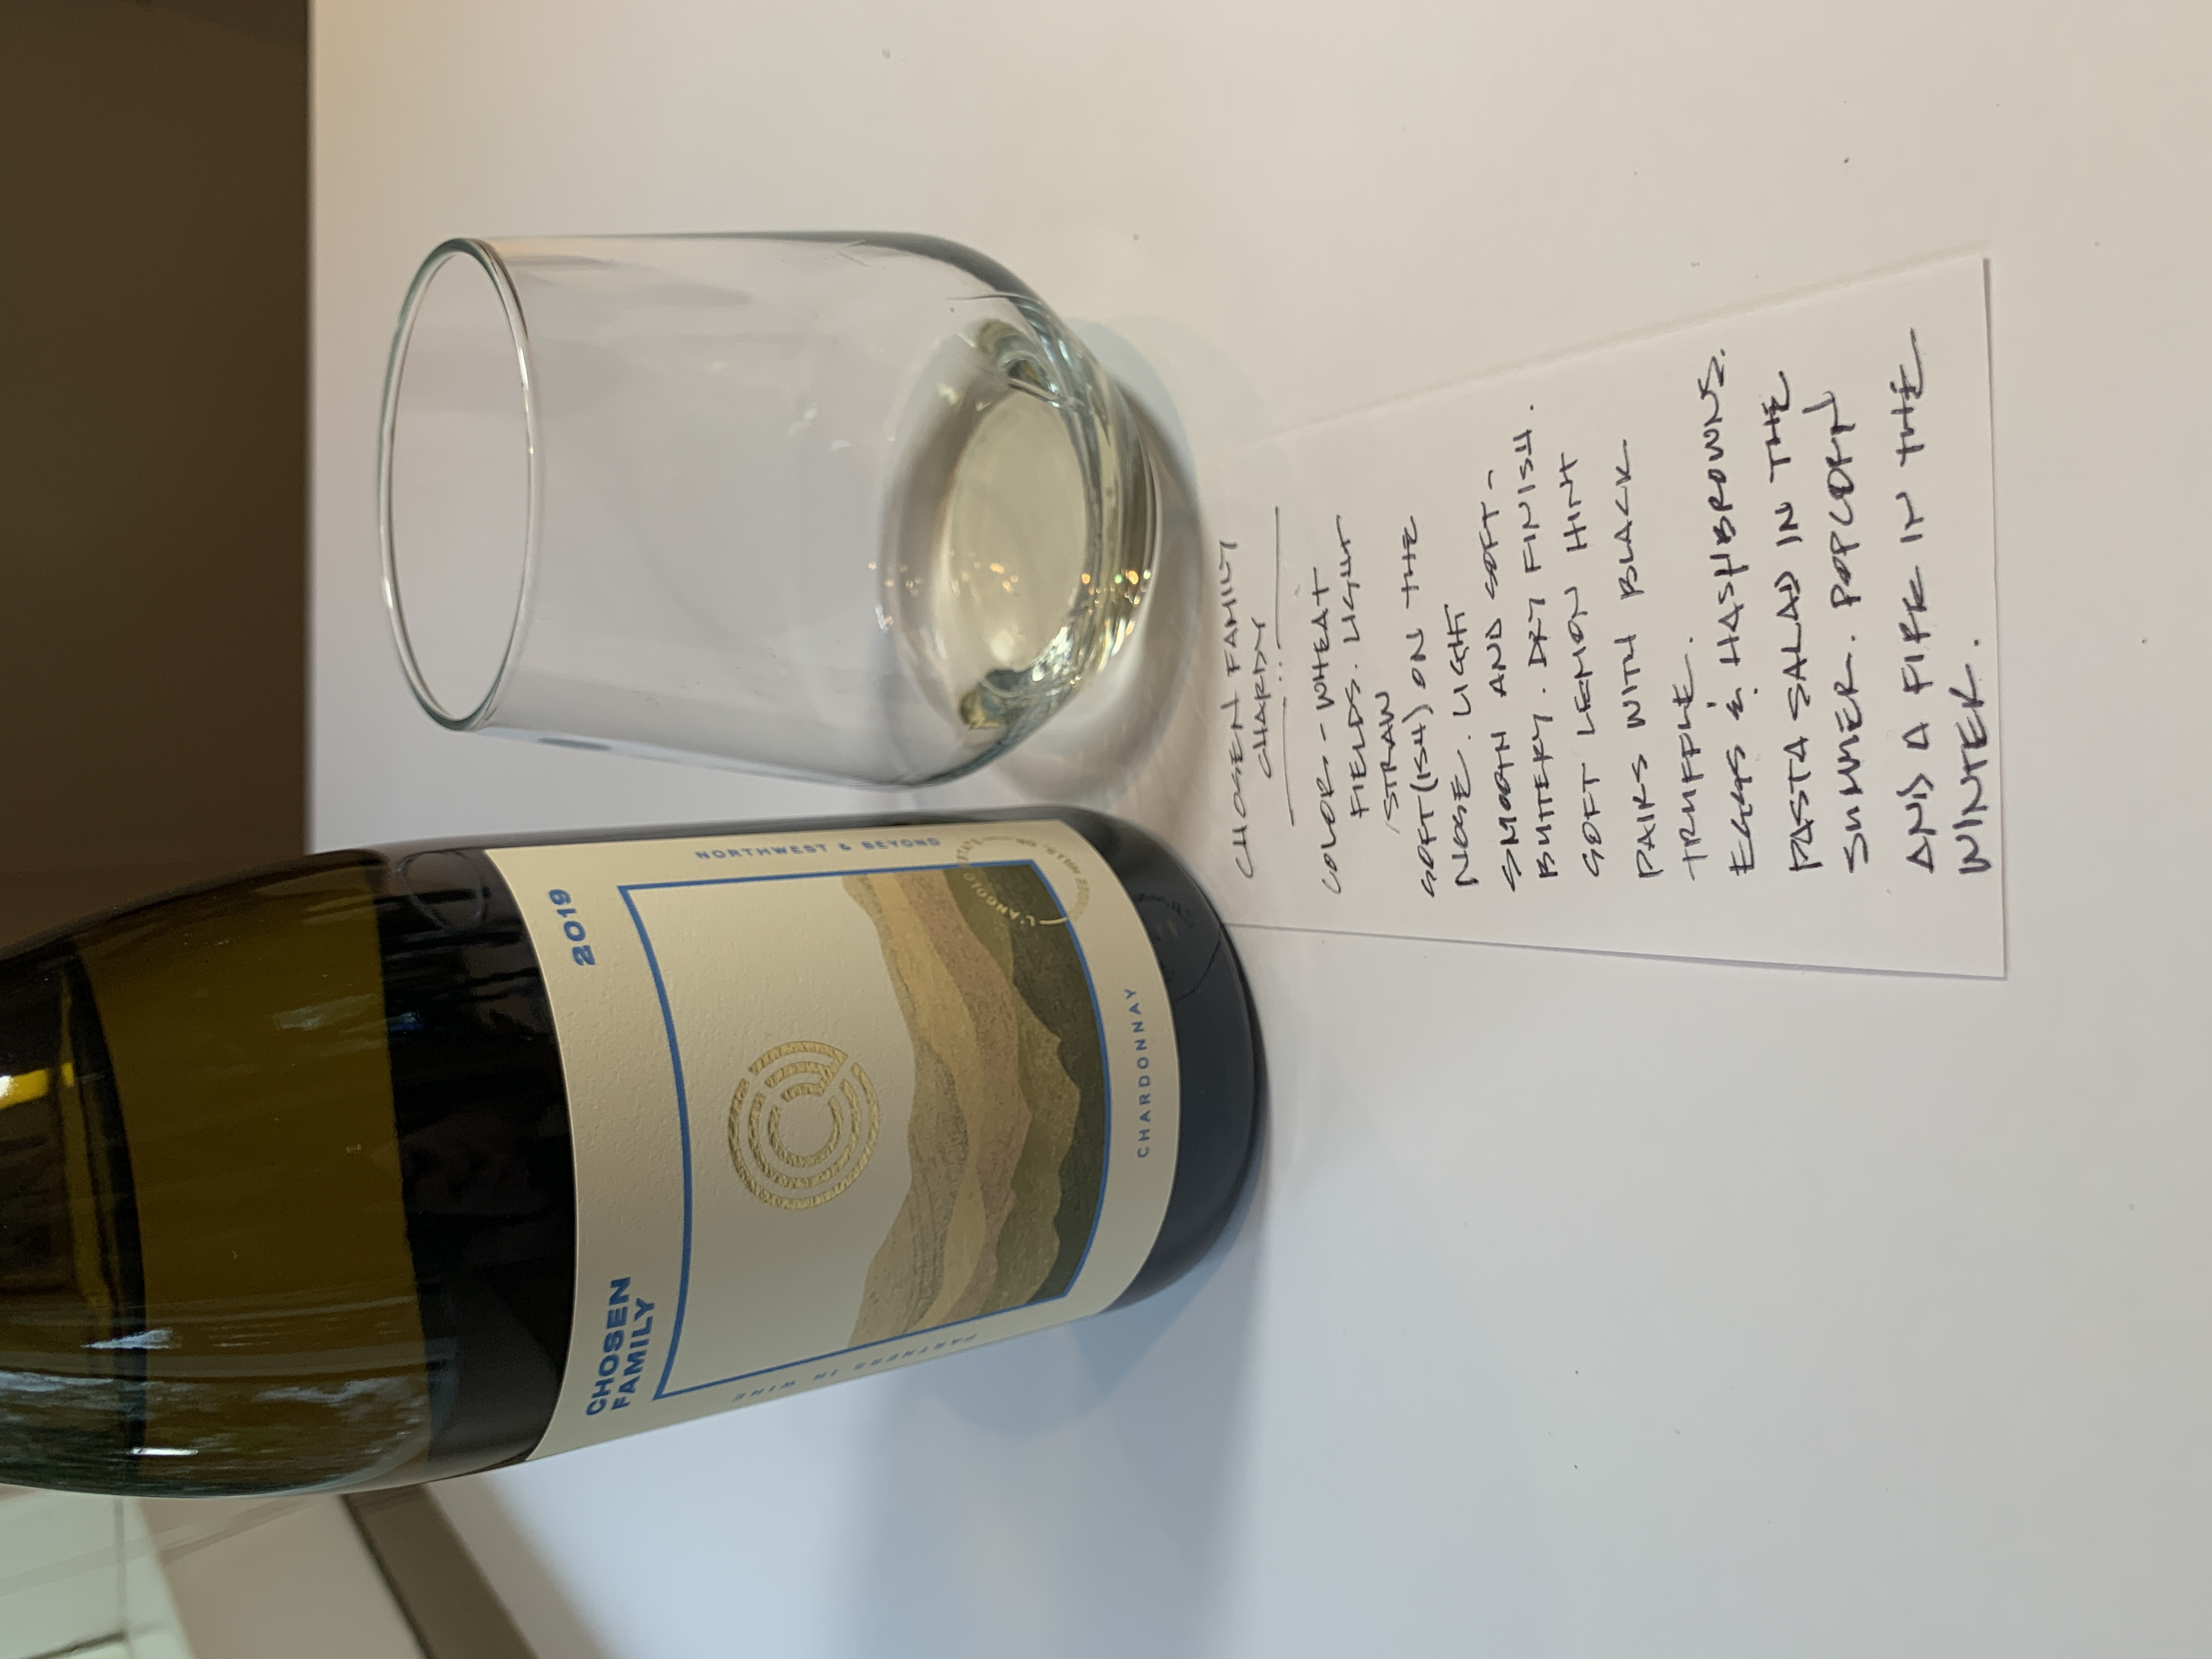 Chosen Family Chardonnay